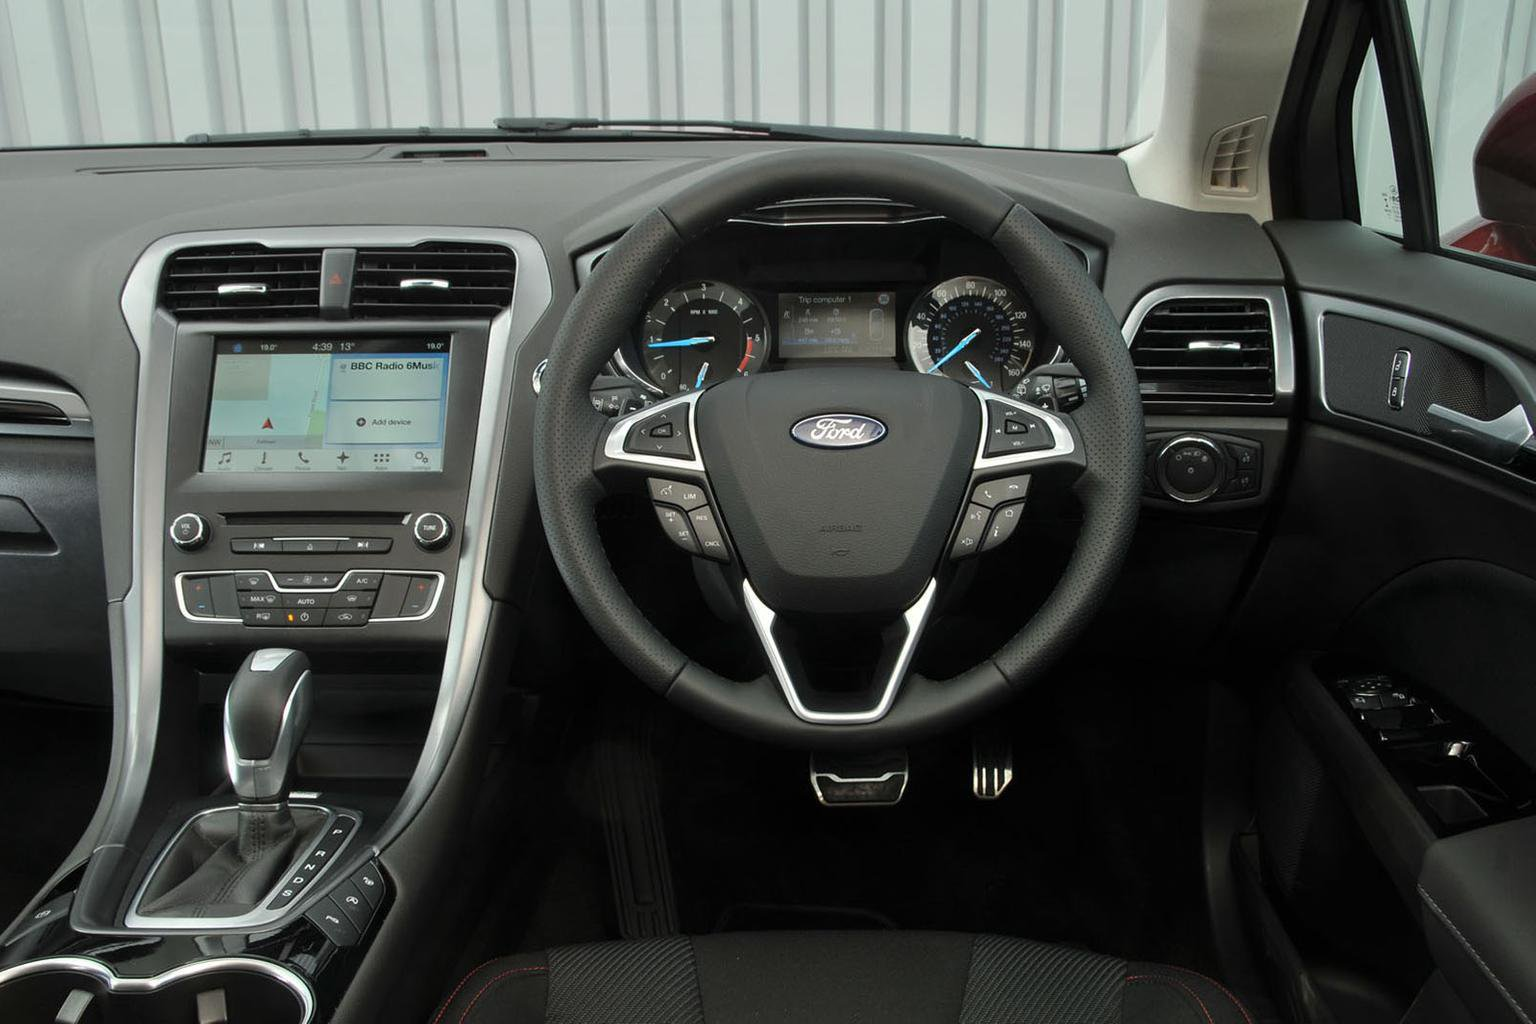 4: Ford Mondeo 1.5 TDCi - interior